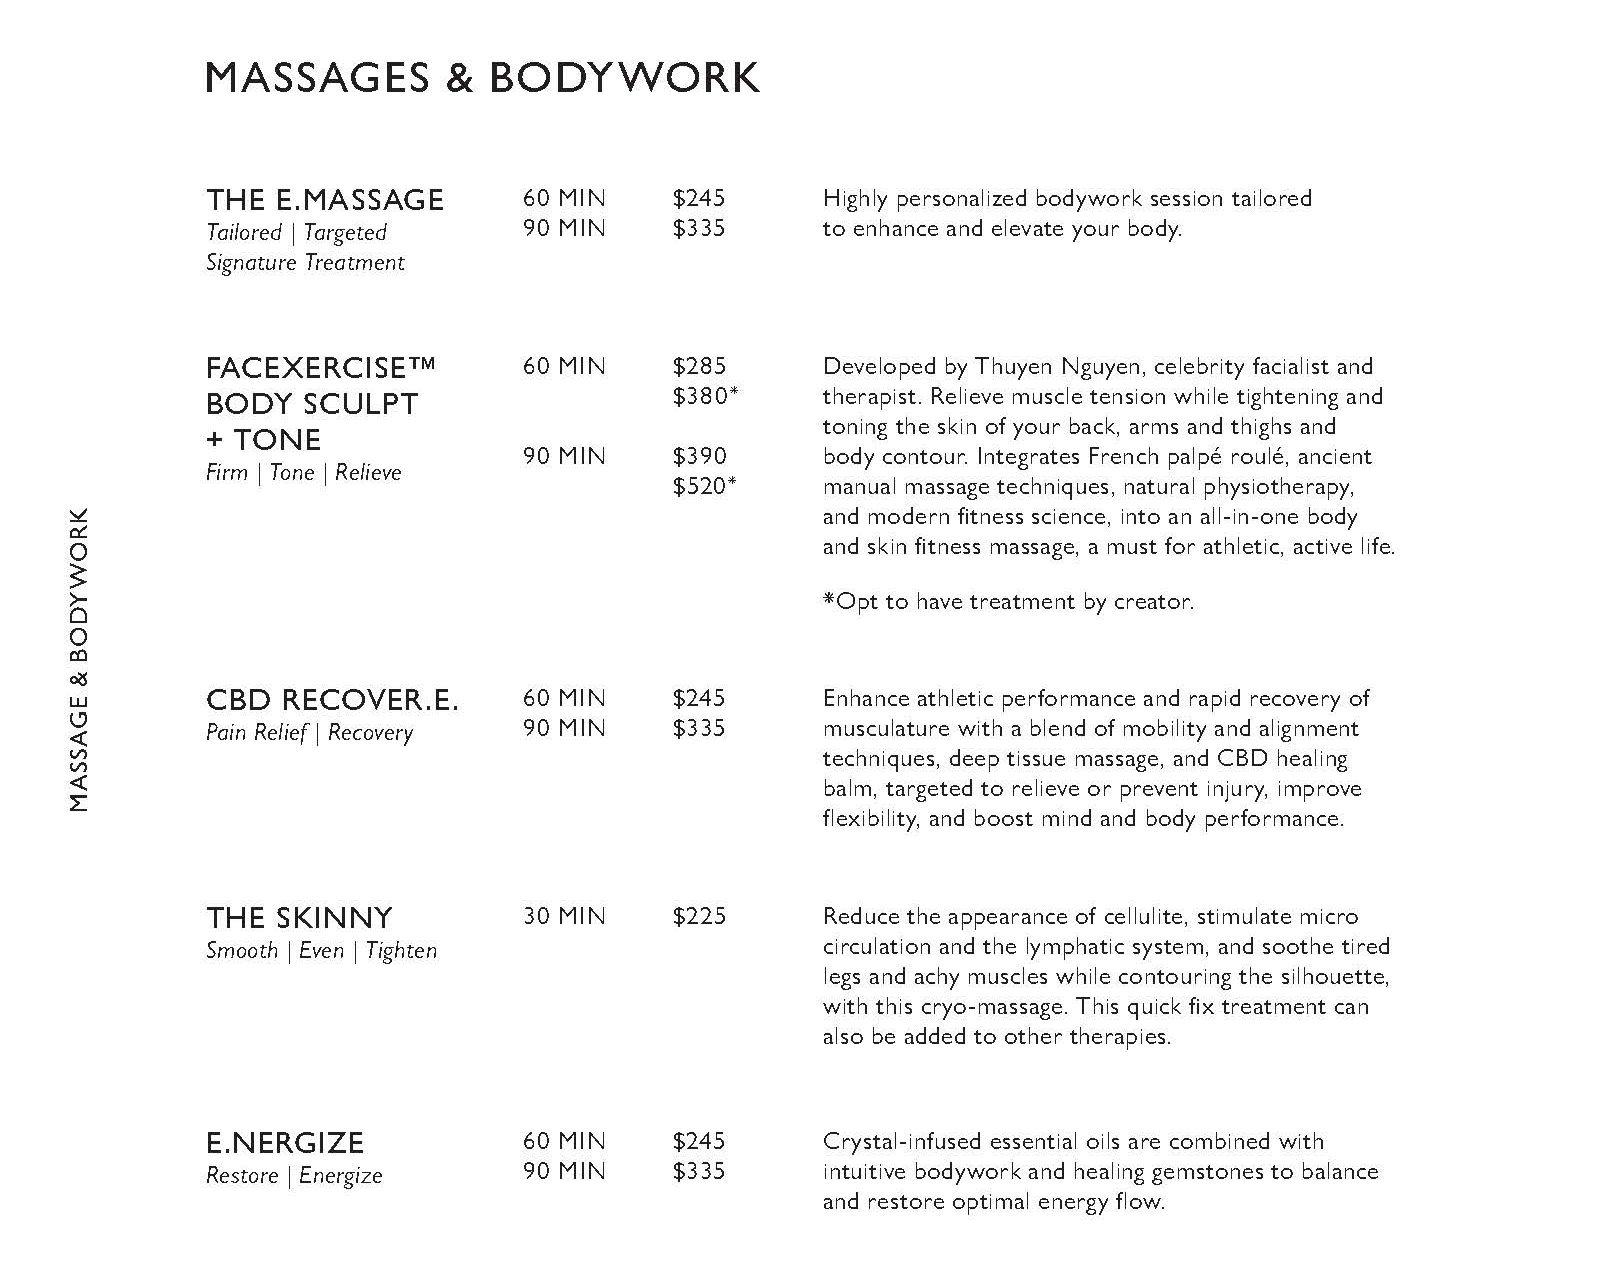 2 massage and bodywork page 1